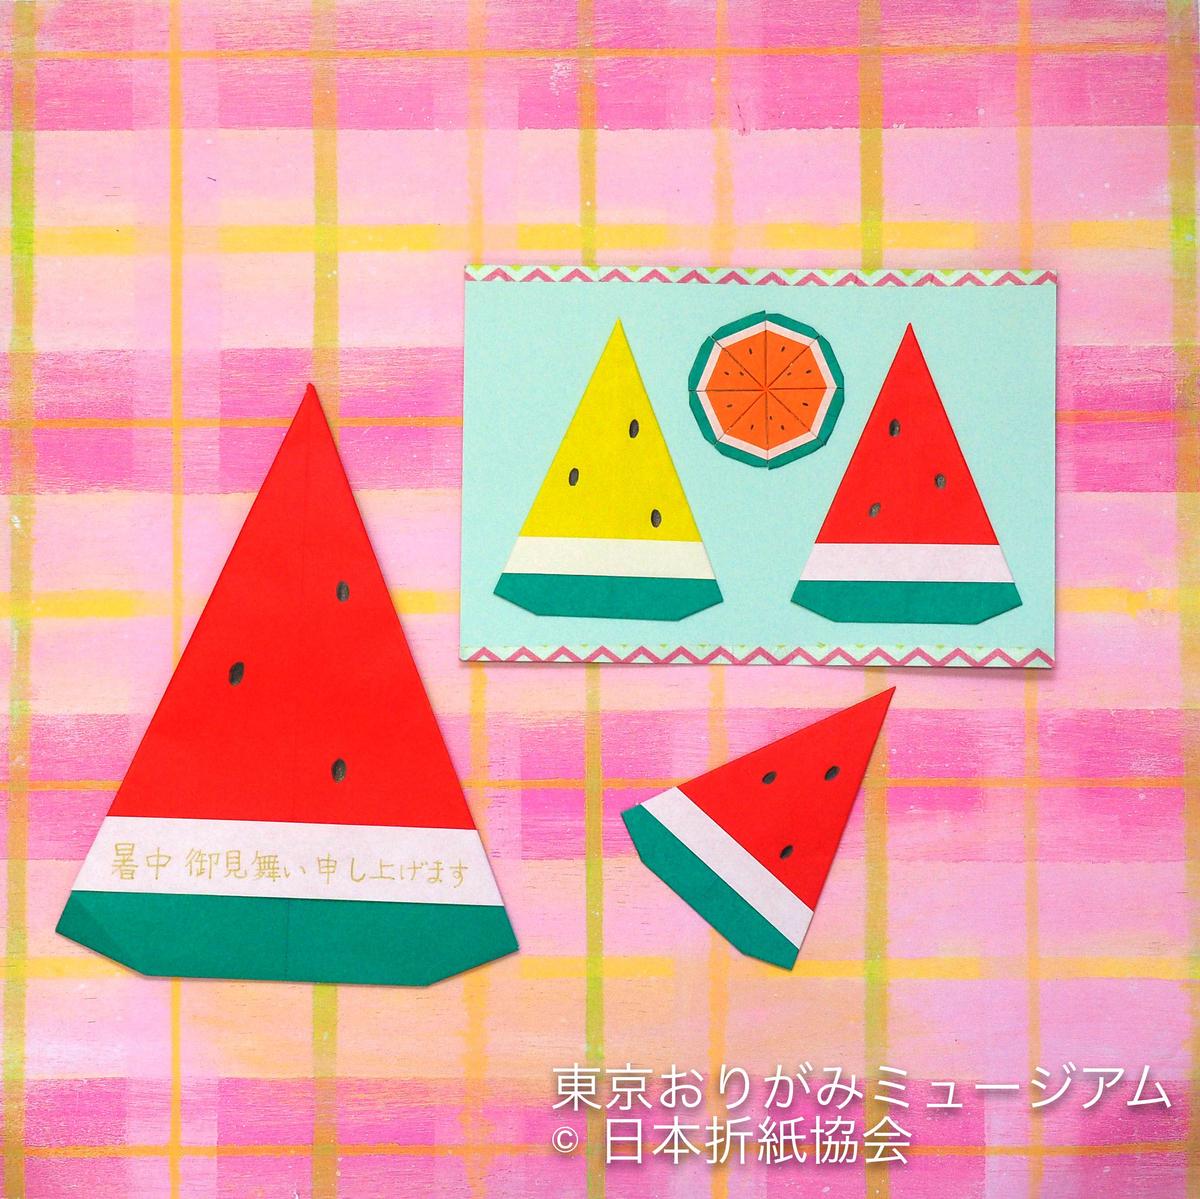 f:id:origami-noa:20190801142911j:plain